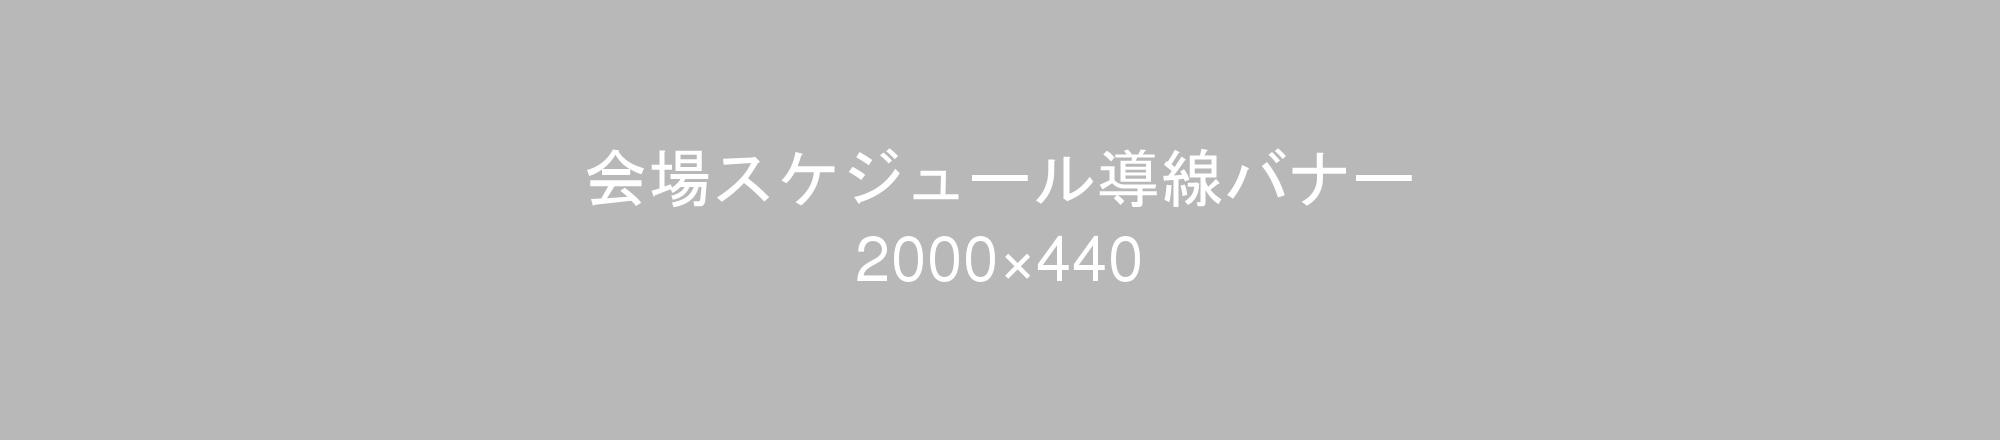 2000×440 (2)